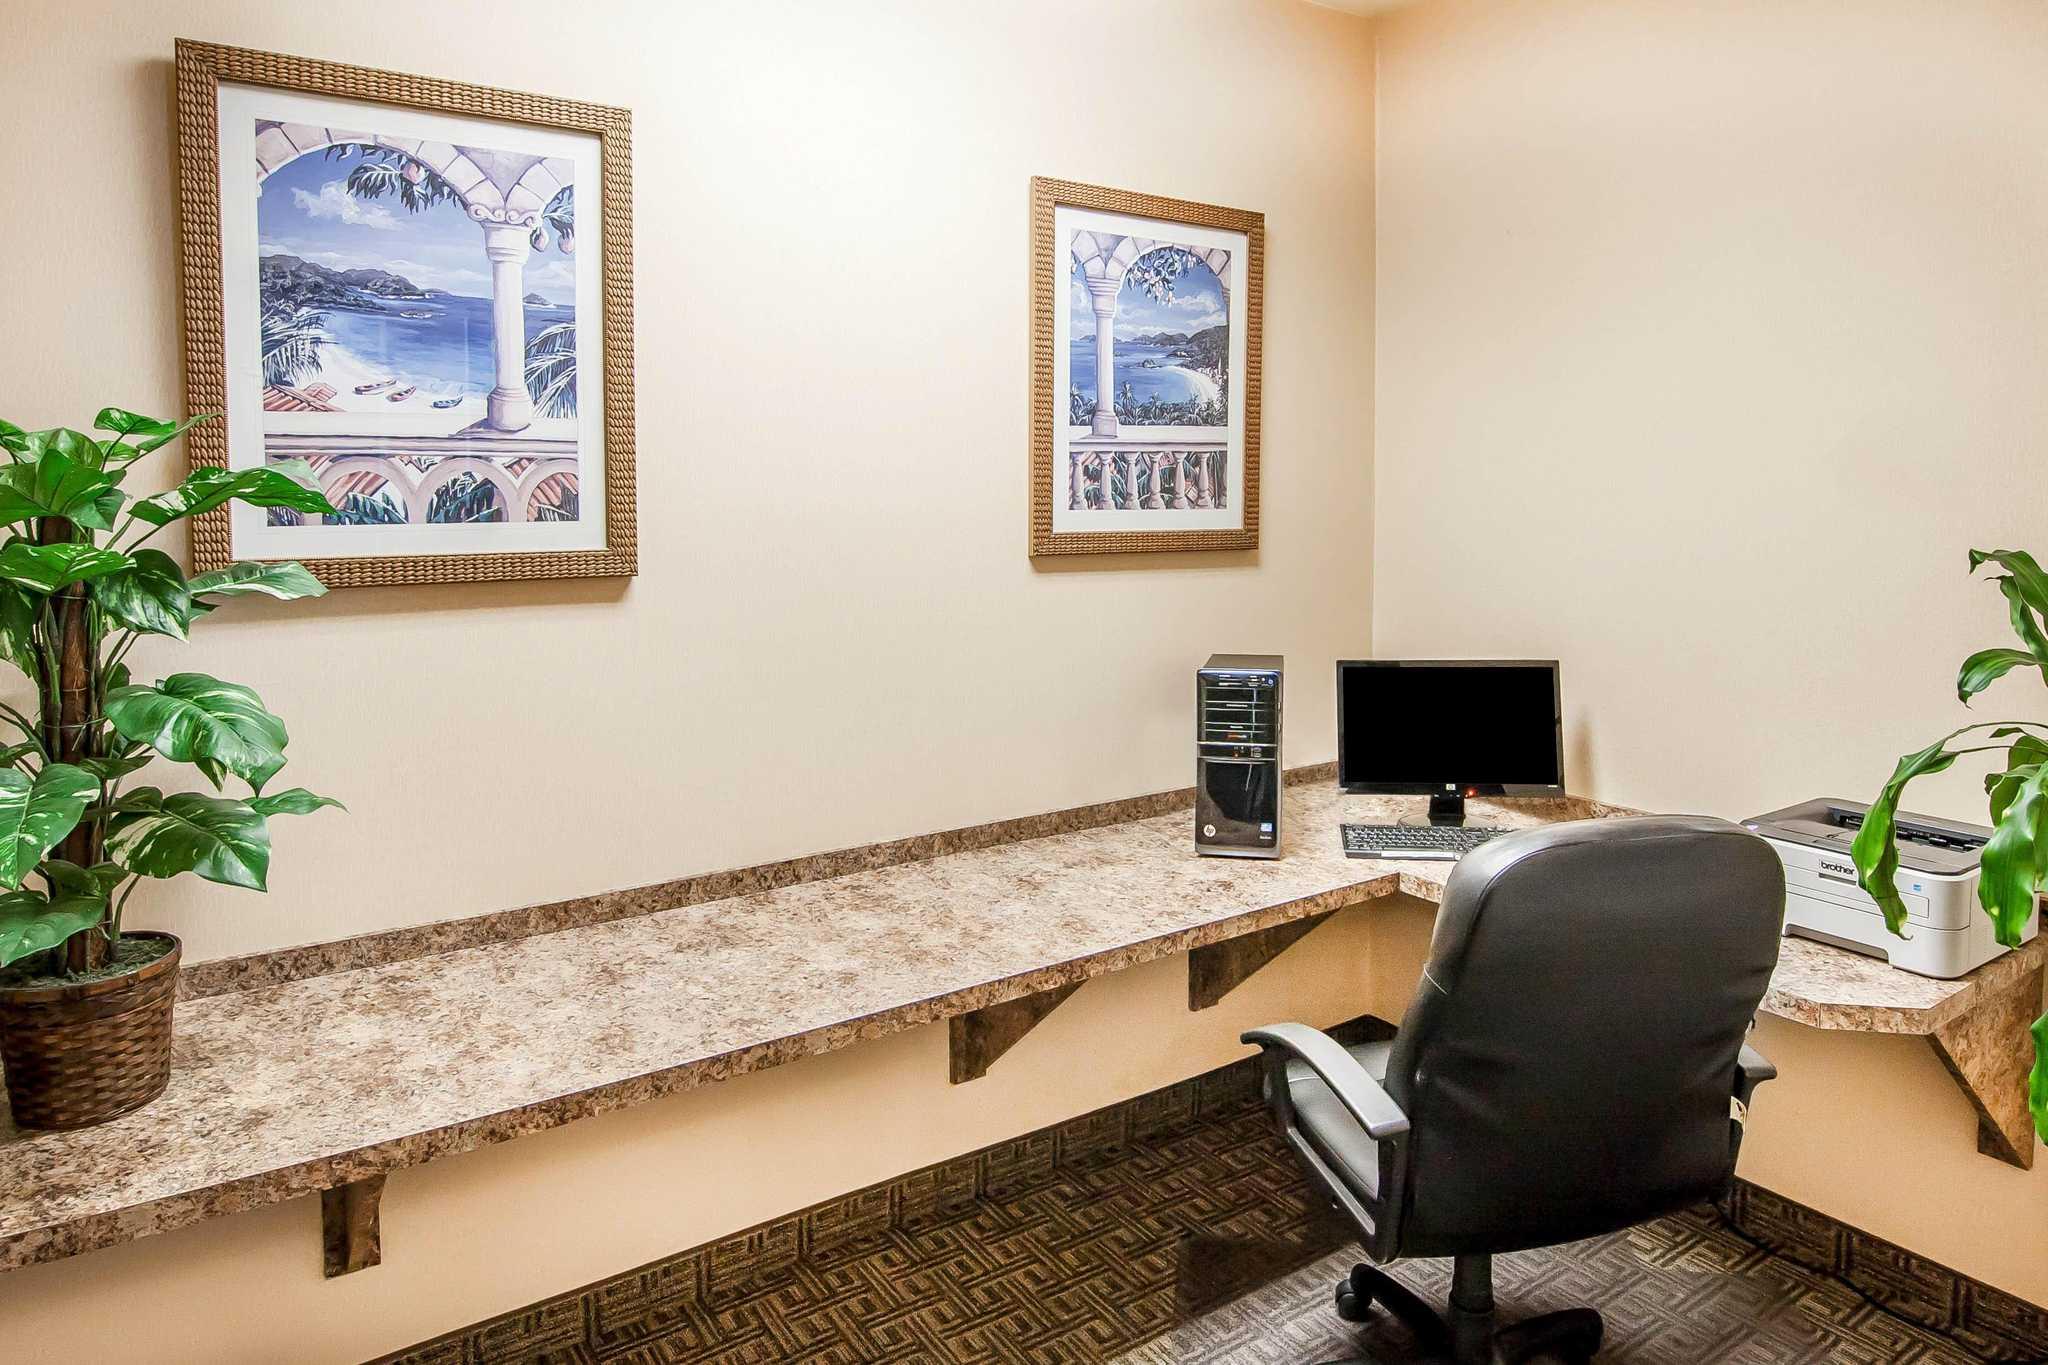 Comfort Inn & Suites image 55